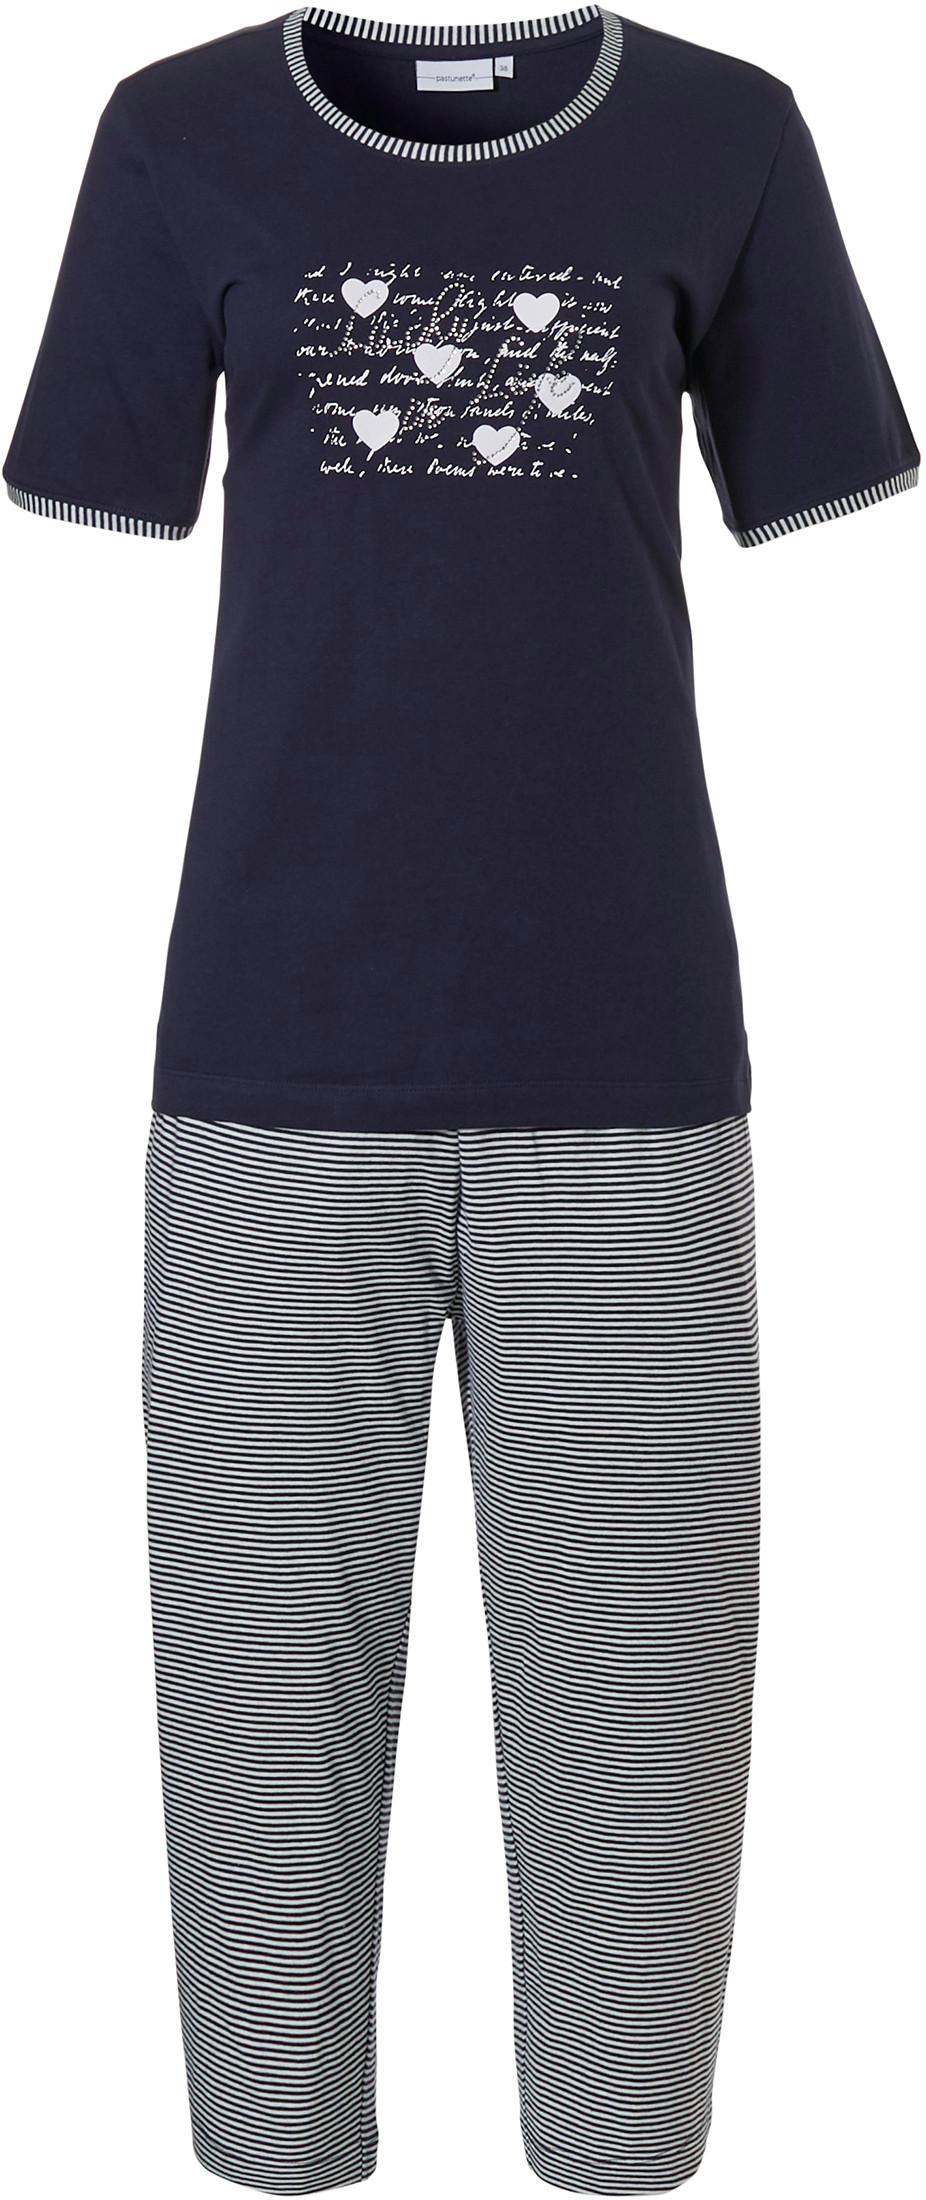 Dames pyjama Pastunette 20211-136-3-38